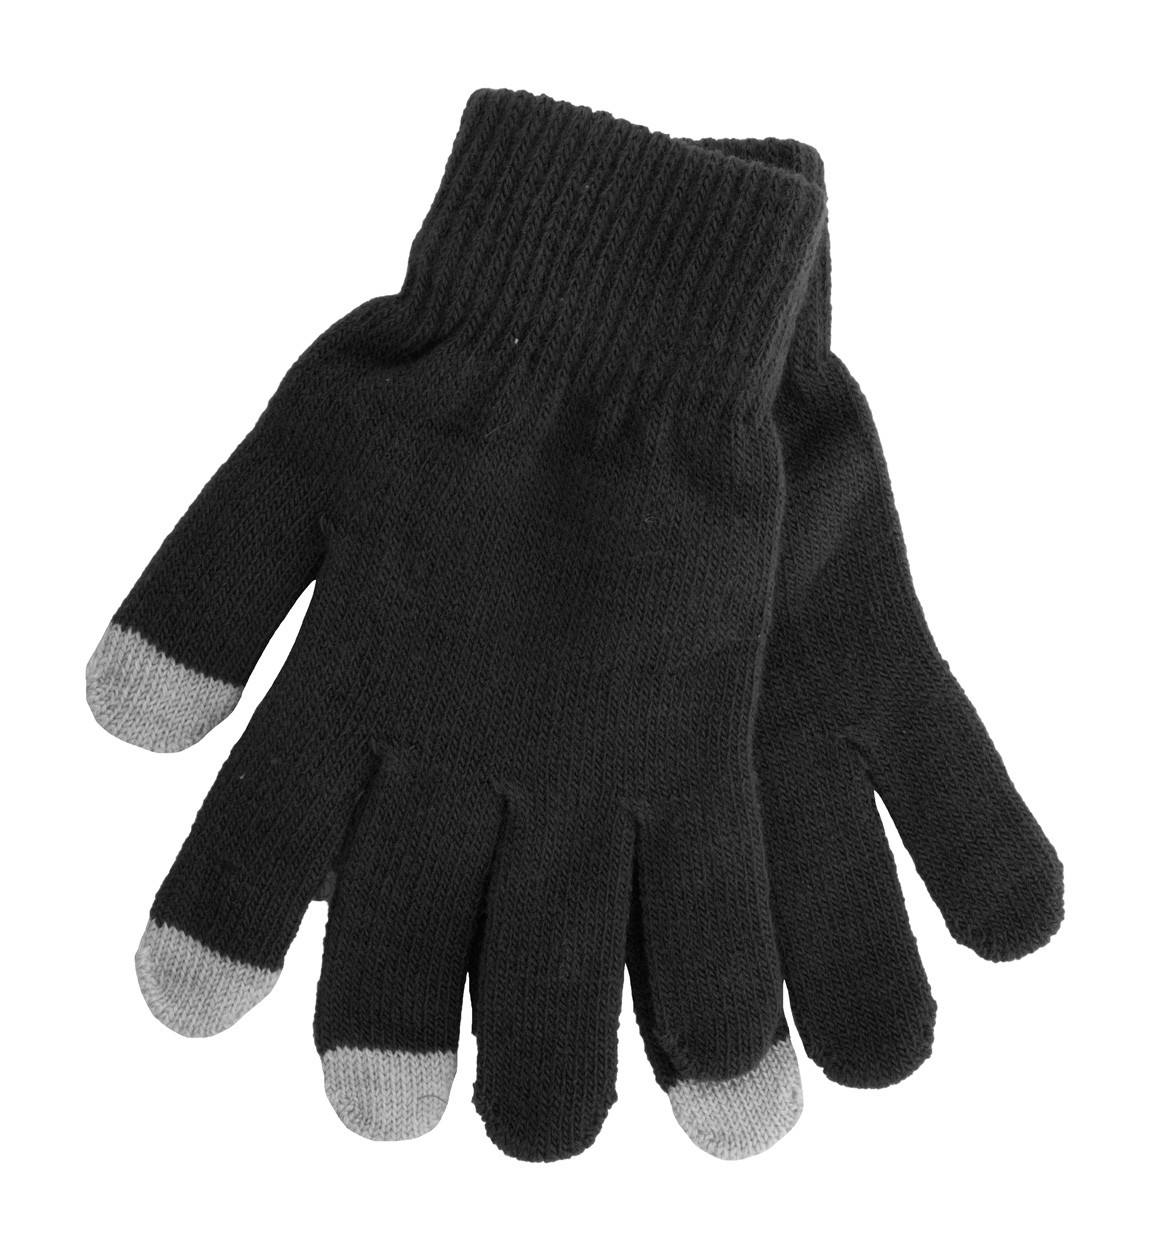 Touch Screen Gloves Actium - Black / Grey